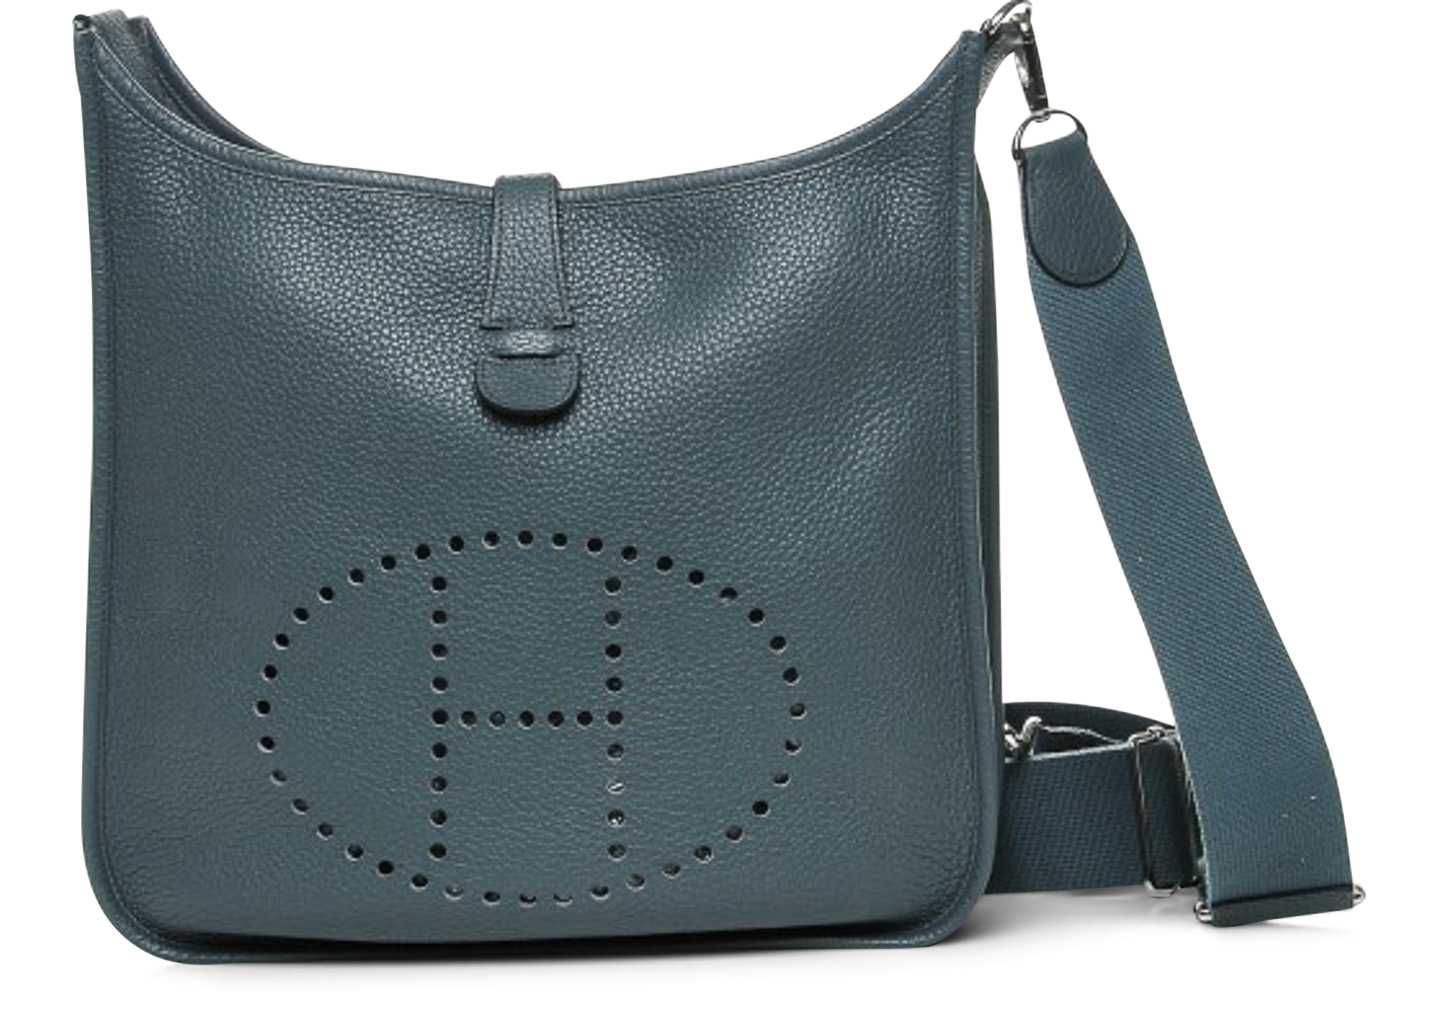 get hermÈs vespa leather crossbody bag fd7f2 b60fc  new style hermes  shoulder bag evelyne iii clemence gm bleu orage dd932 a70fa b53e3be0faeeb